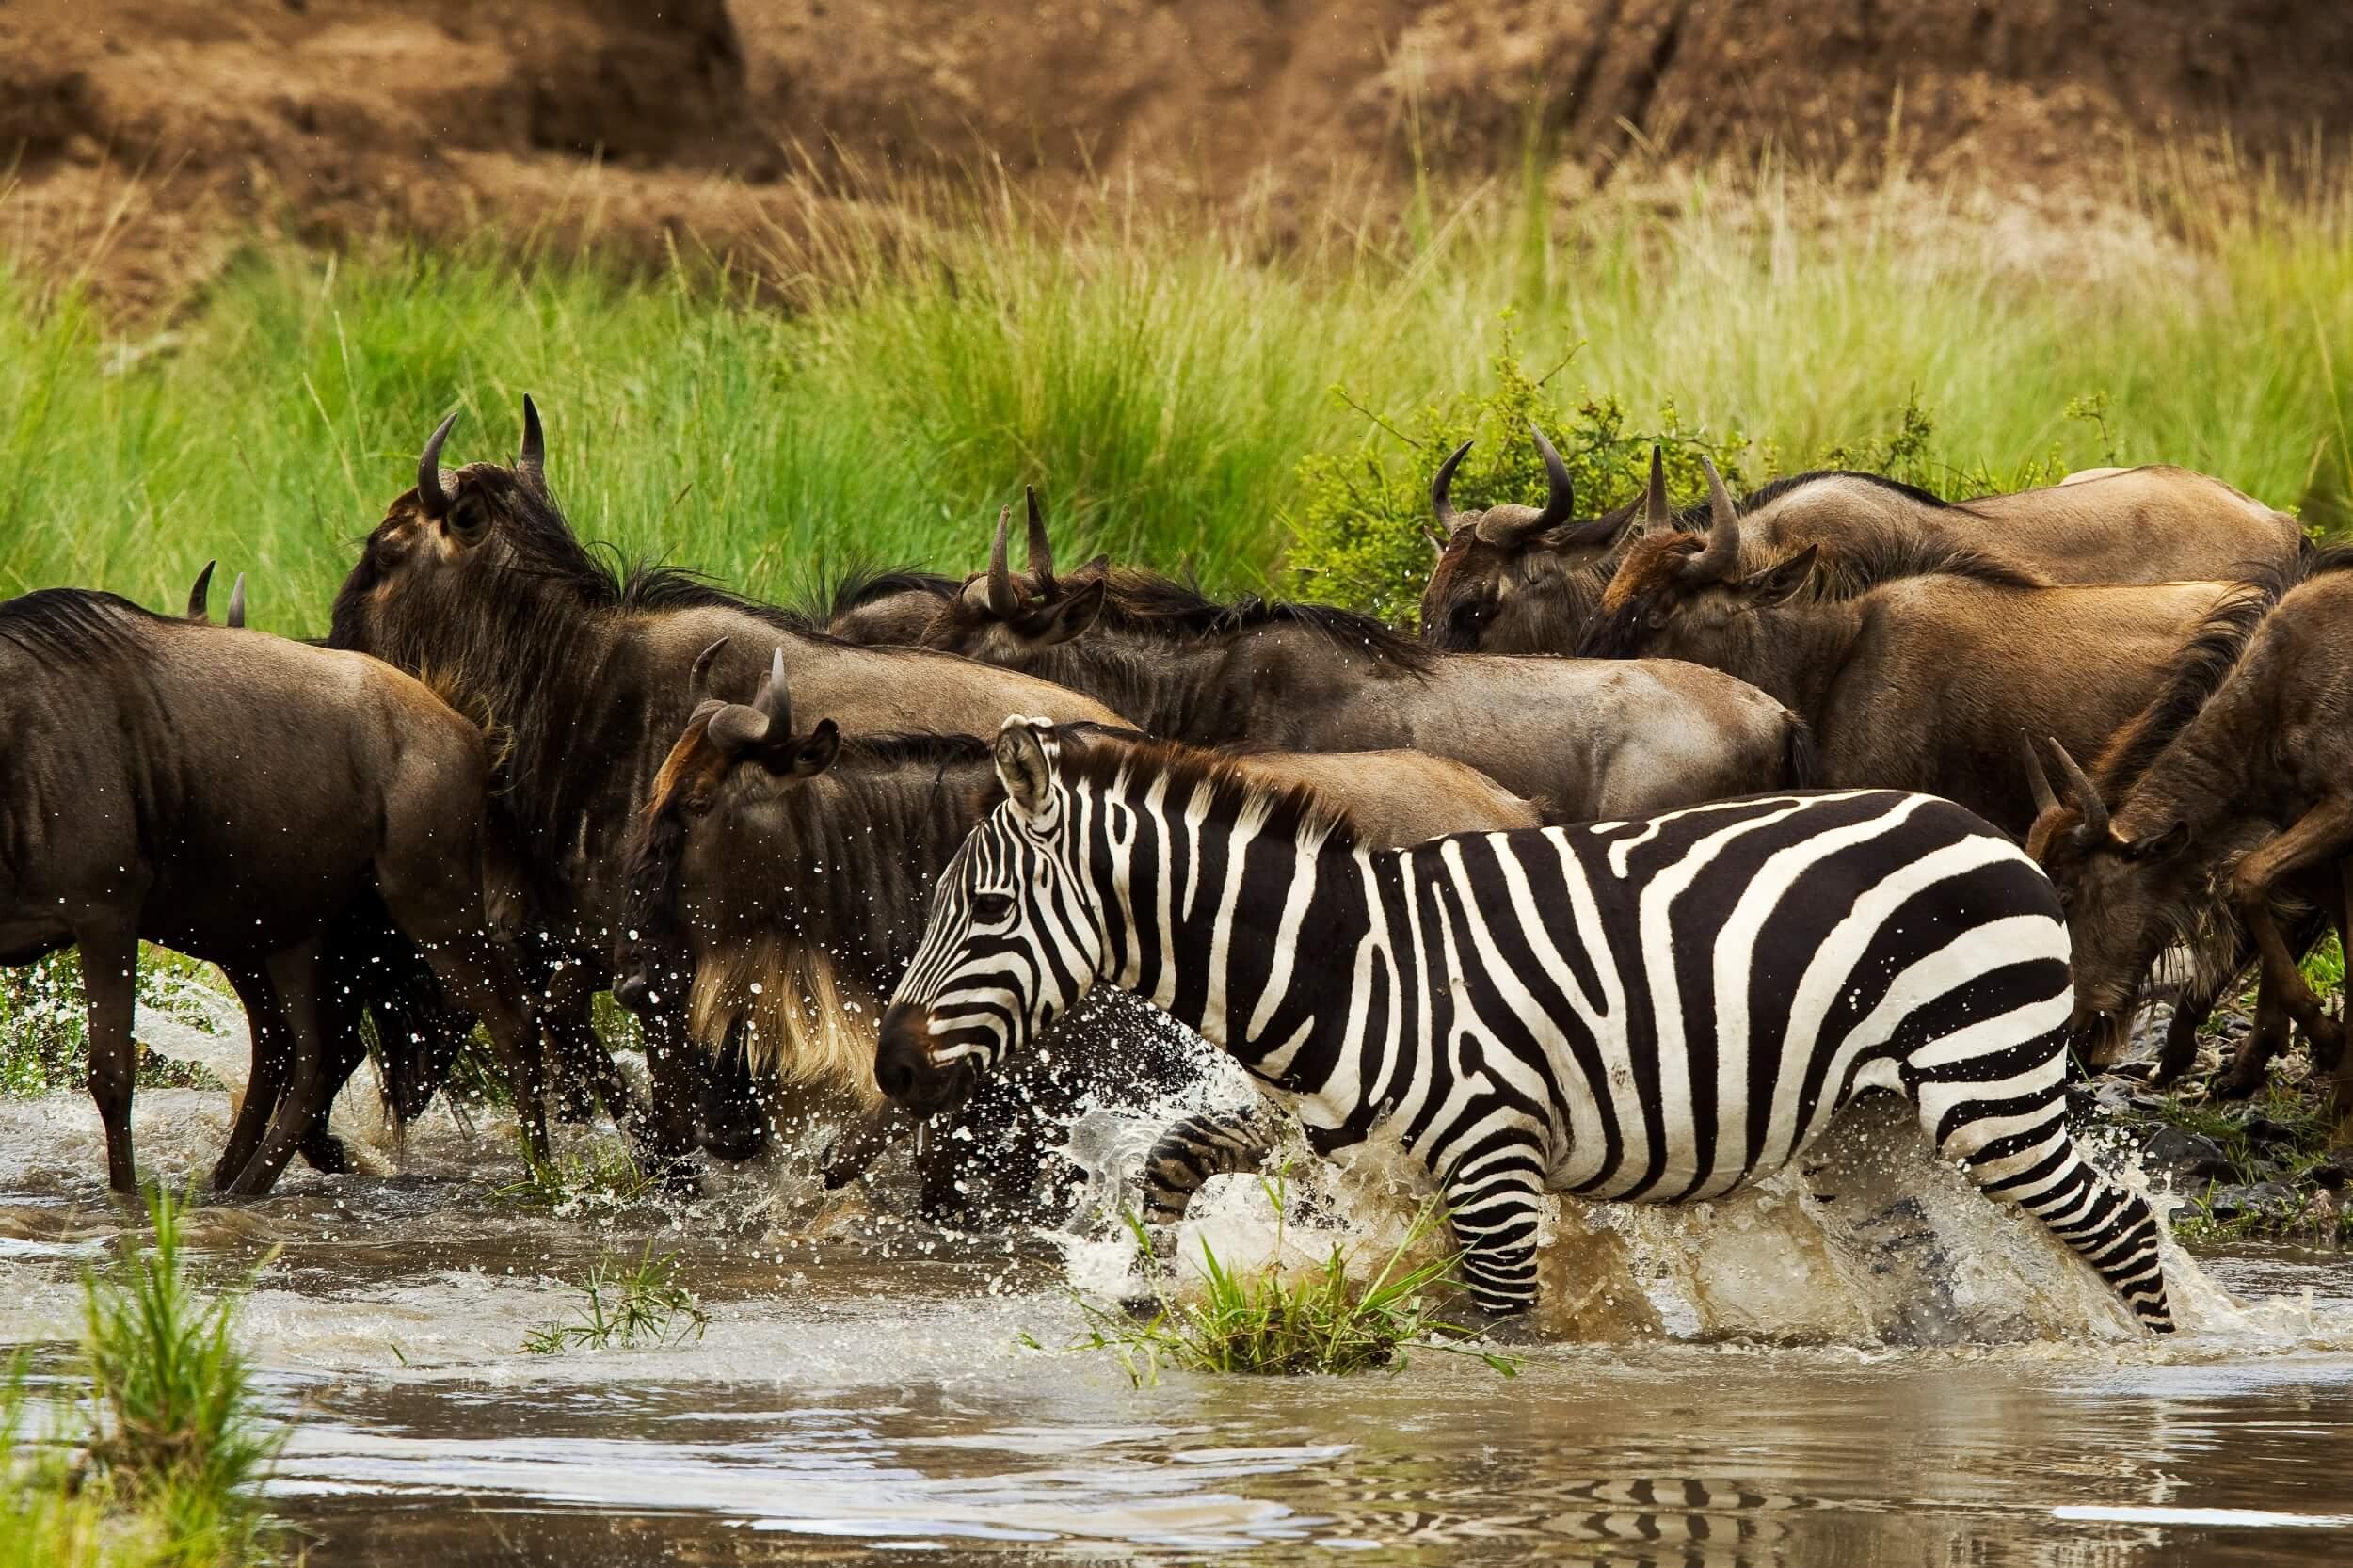 MaraExpeditionCamp-Wildlife-GreatPlainsConservation-17.jpg